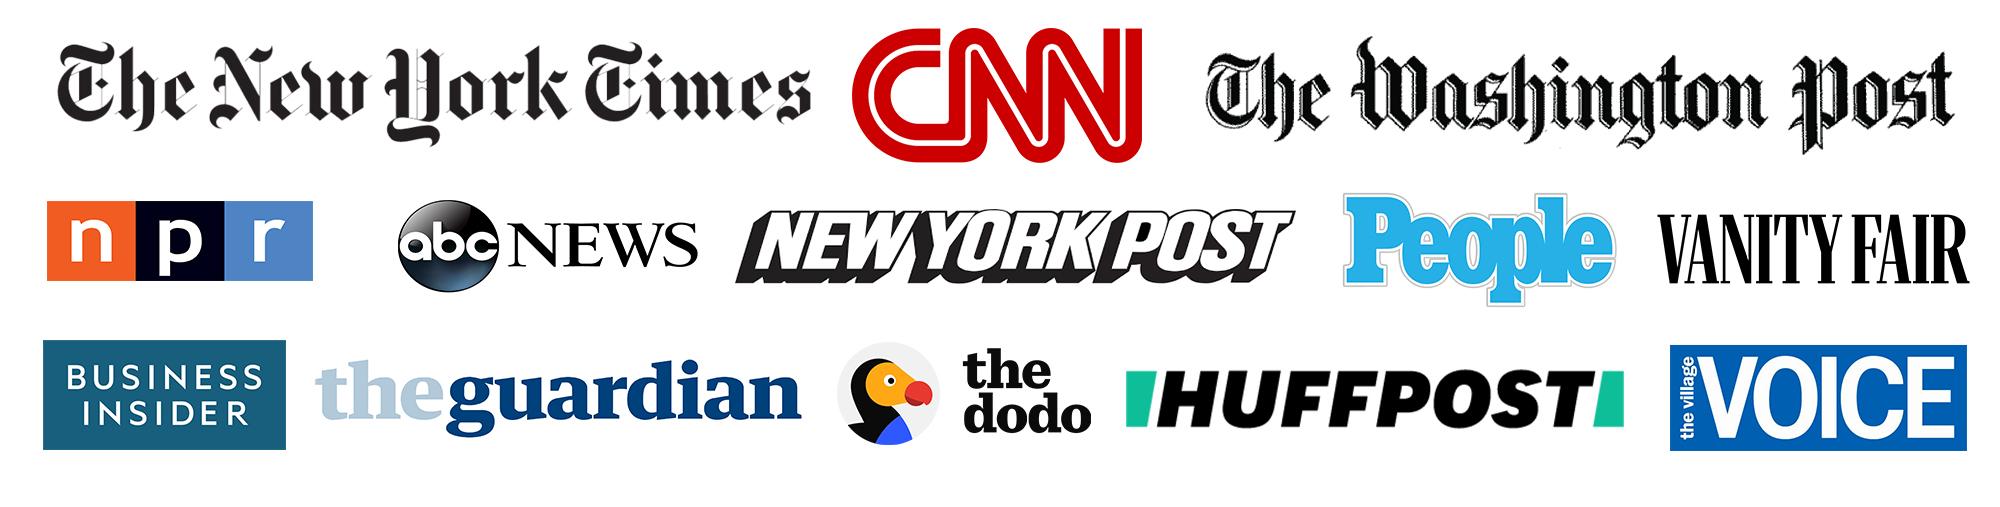 Press logos banner.jpg